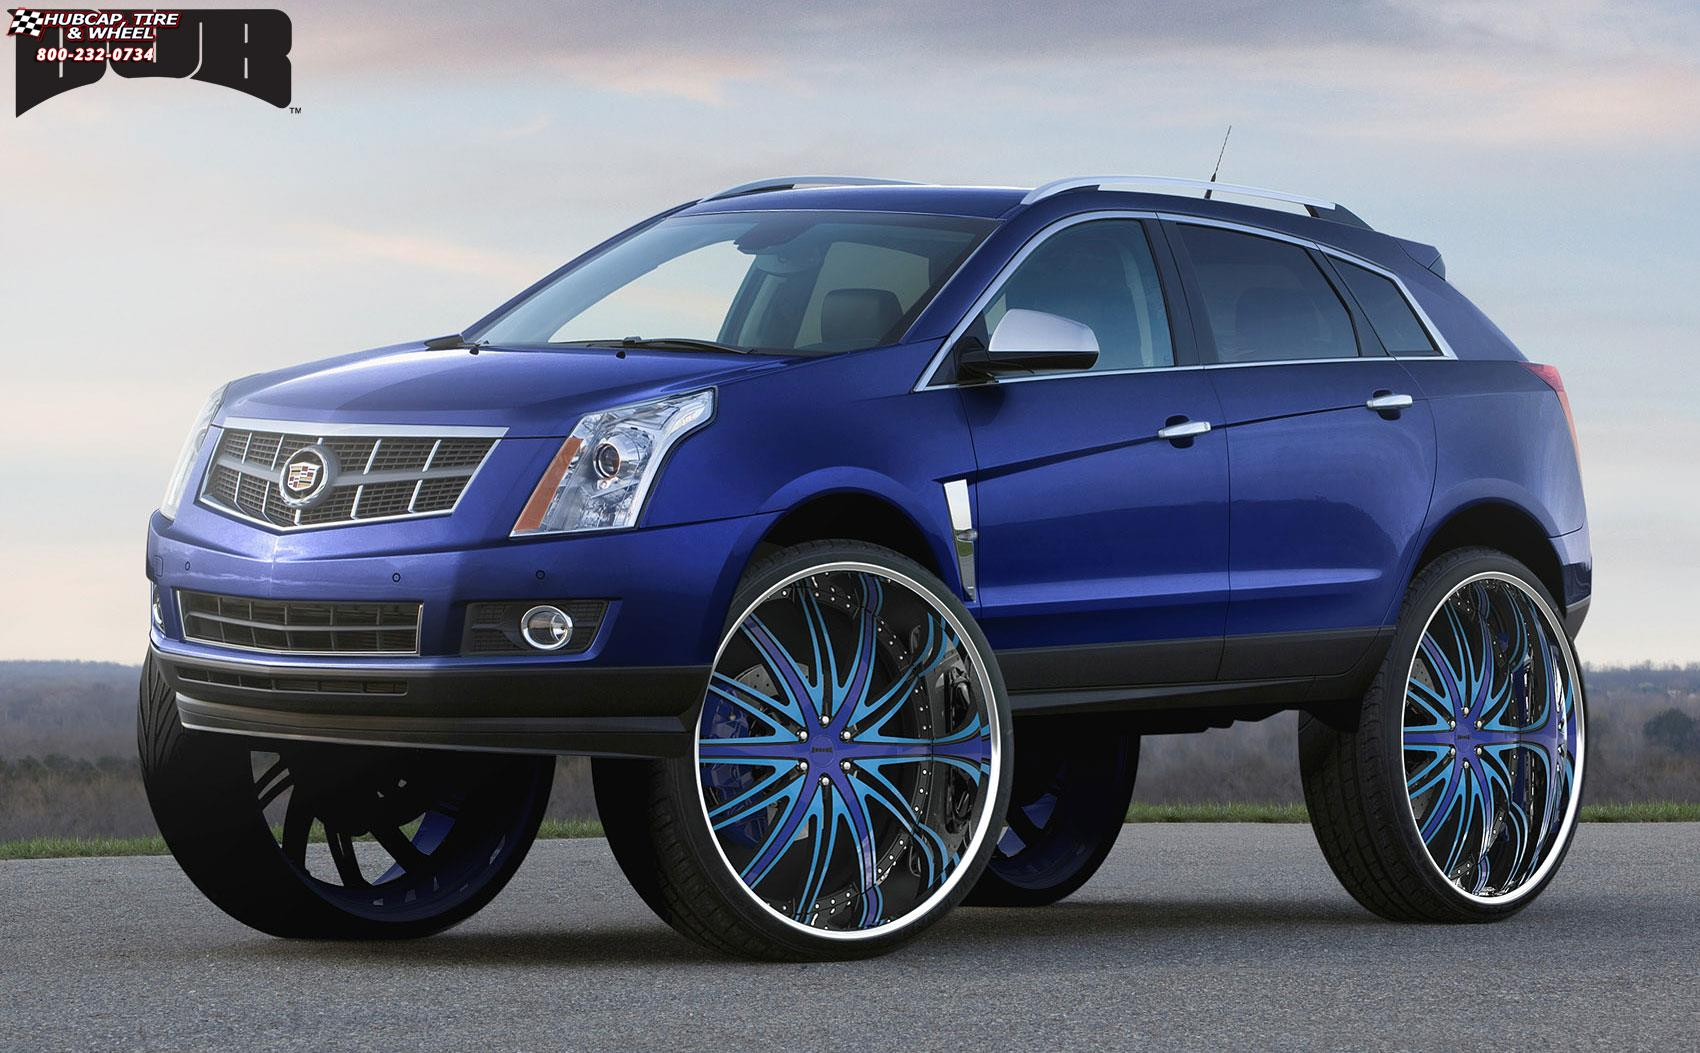 cadillac srx dub c22 flex wheels blue w black accents. Black Bedroom Furniture Sets. Home Design Ideas